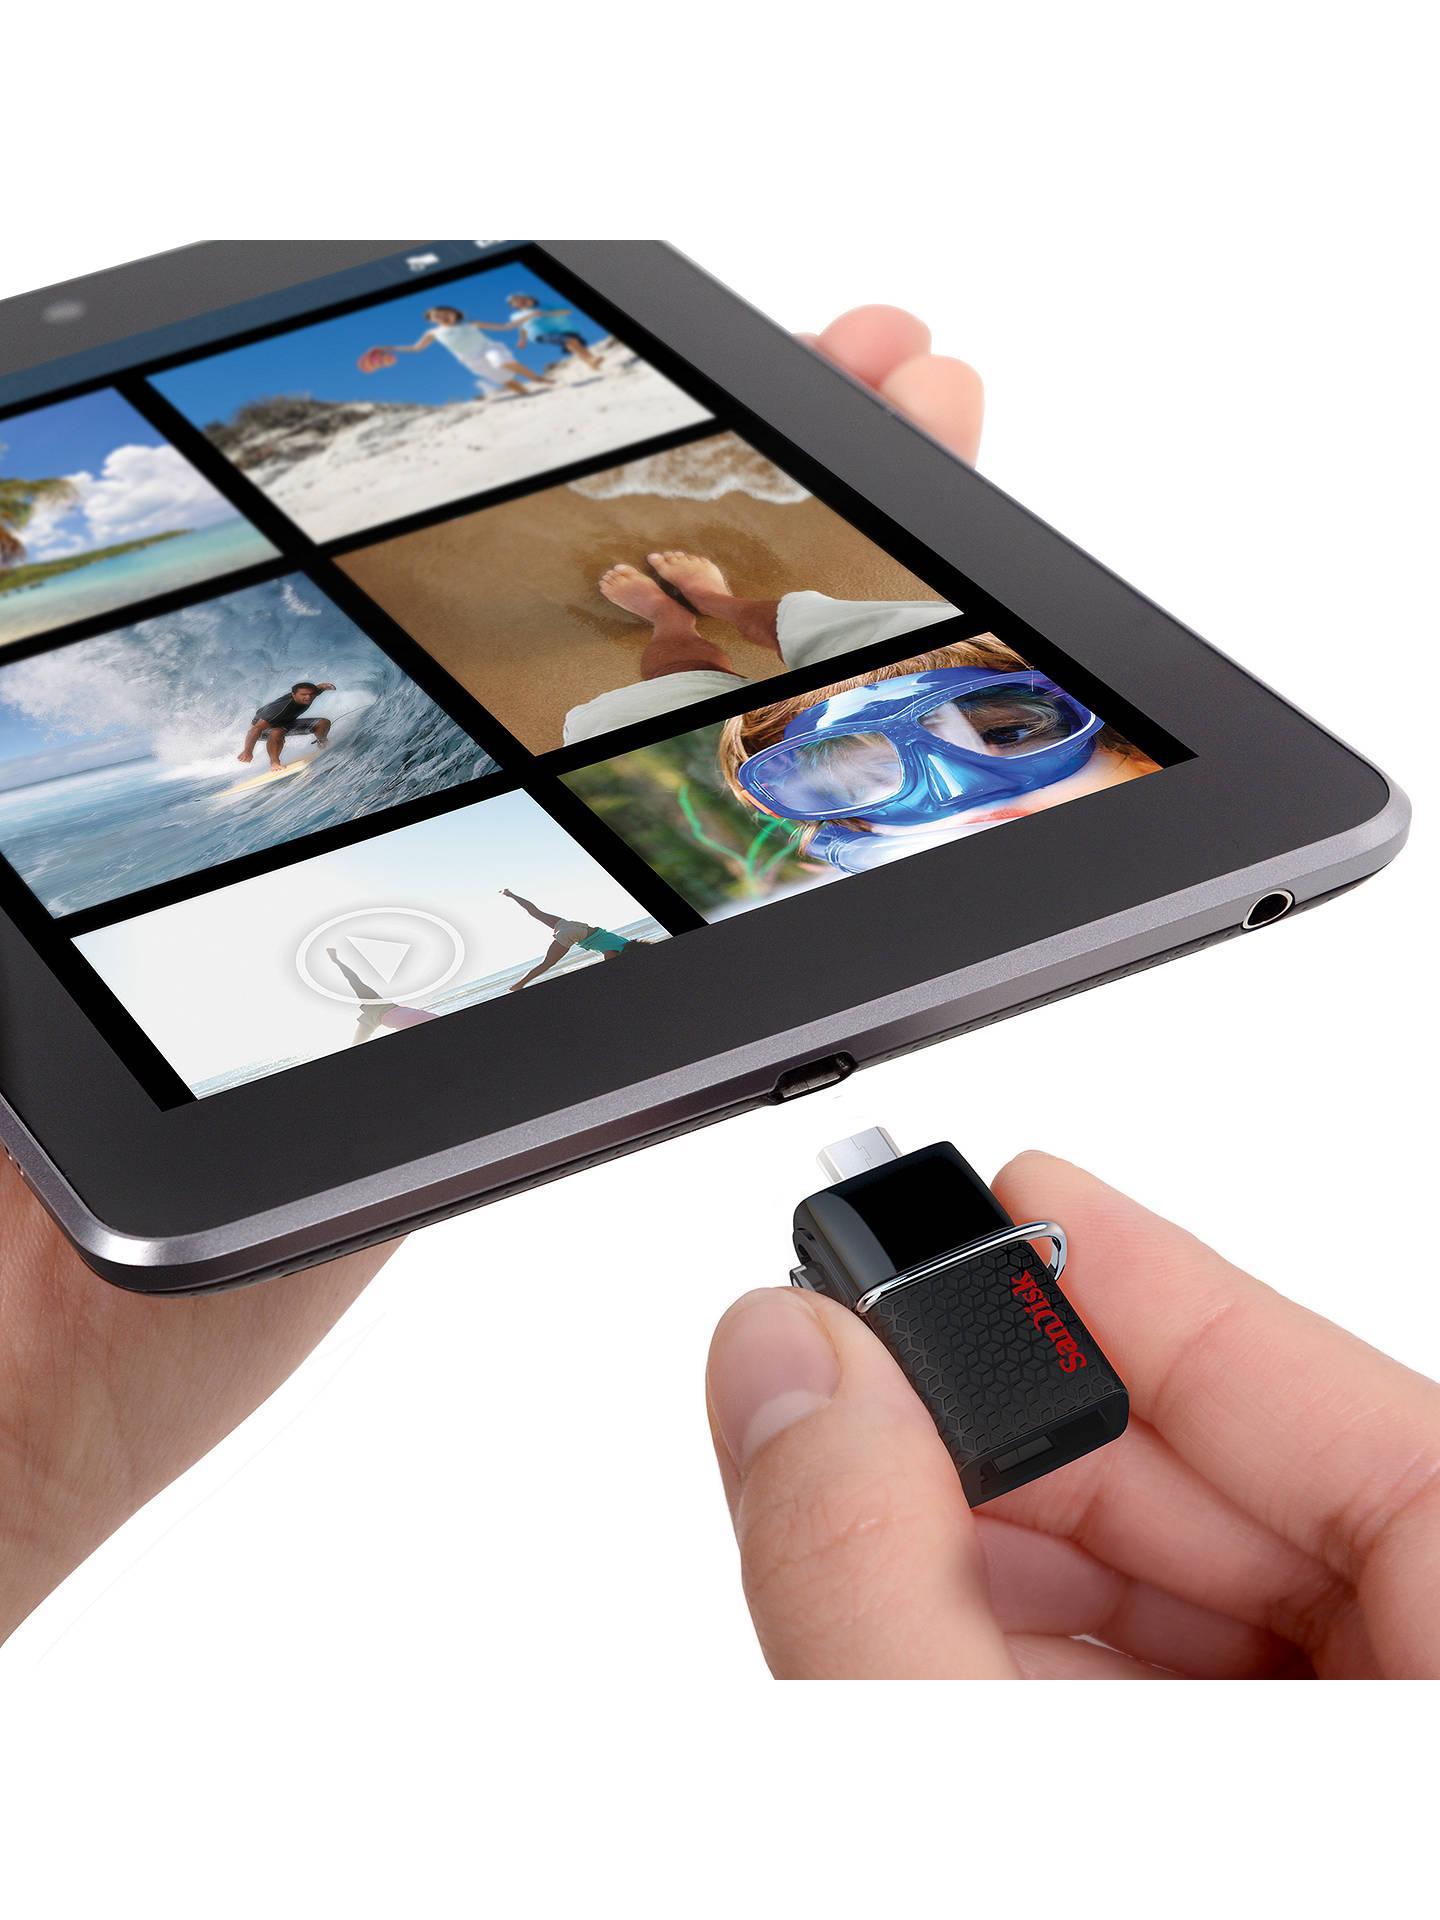 Sandisk Ultra Dual Usb Drive 30 And Micro Flash 32gb At Original Buysandisk Online Johnlewis